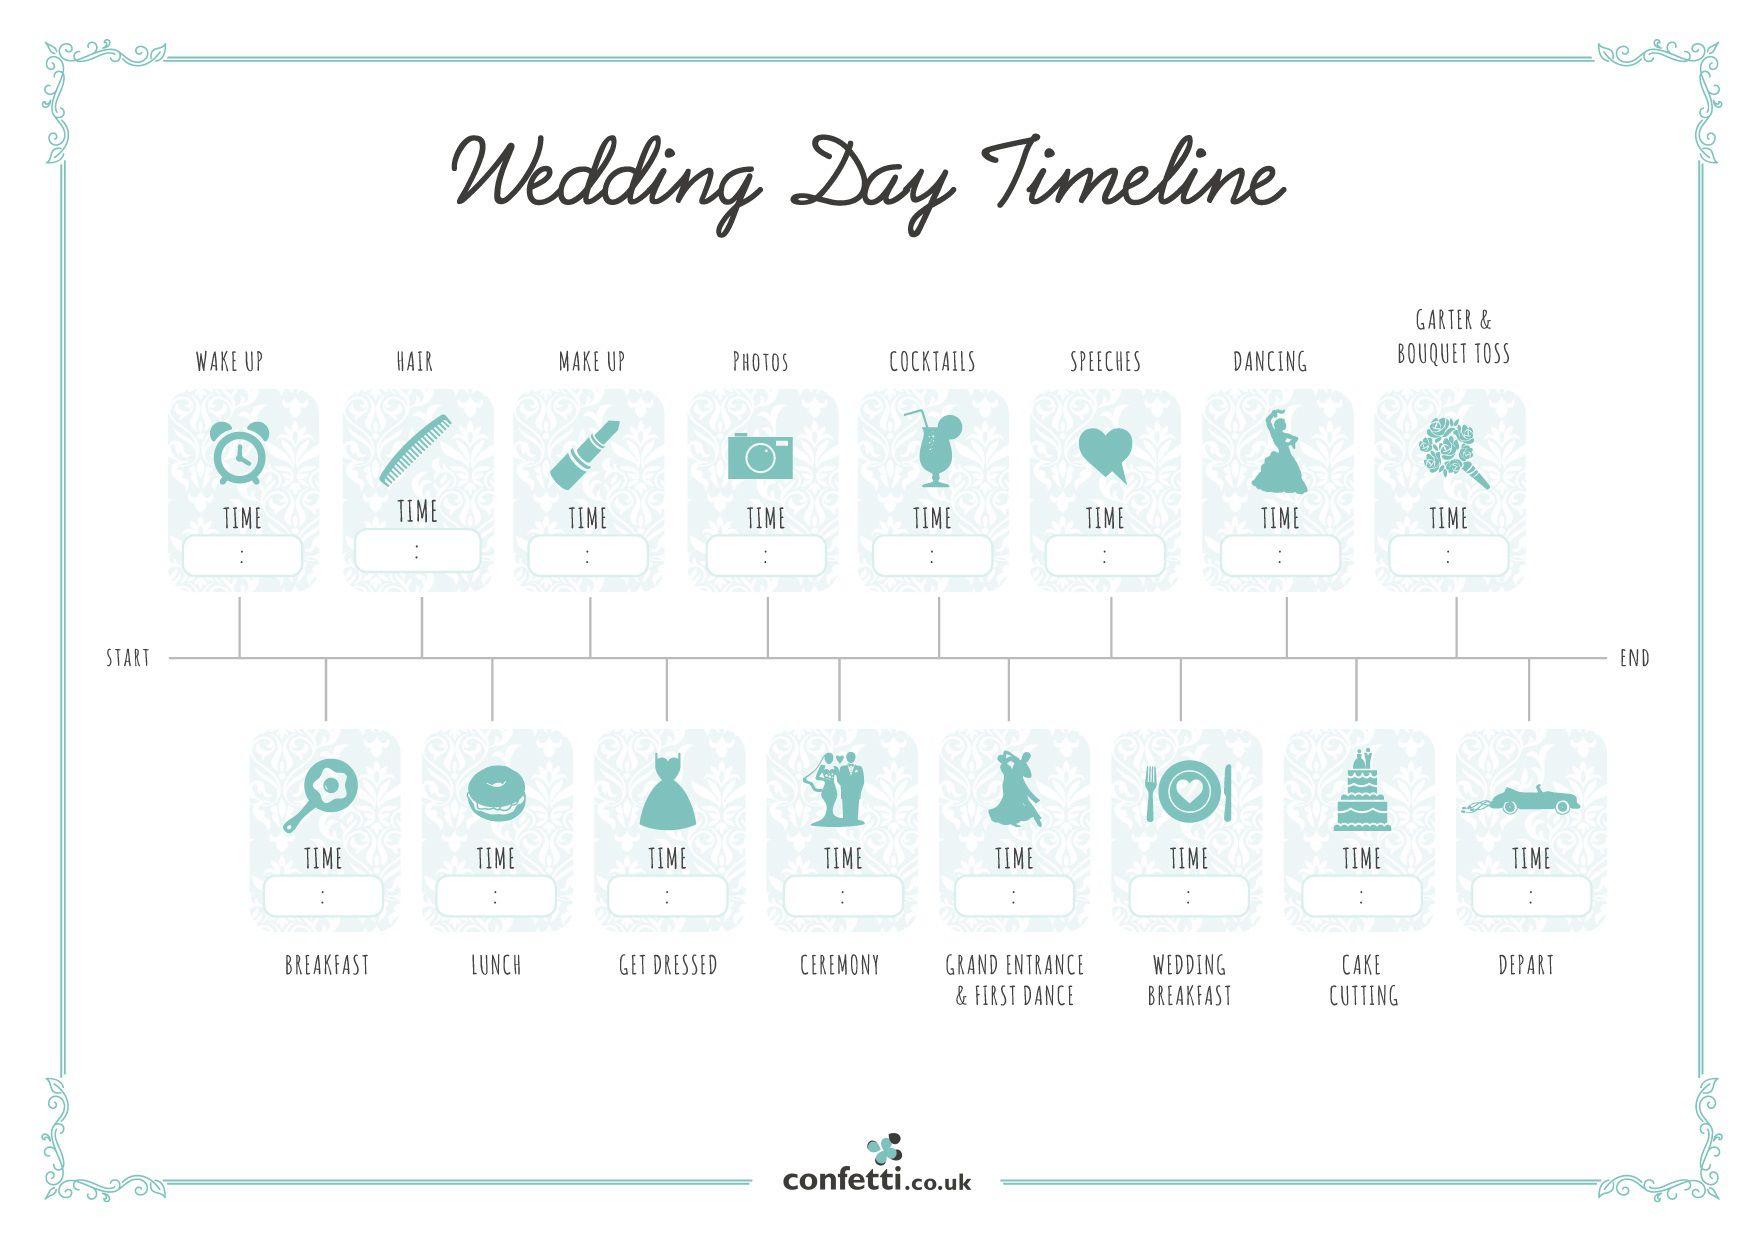 007 Unusual Wedding Timeline Template Free High Resolution  Day Excel ProgramFull